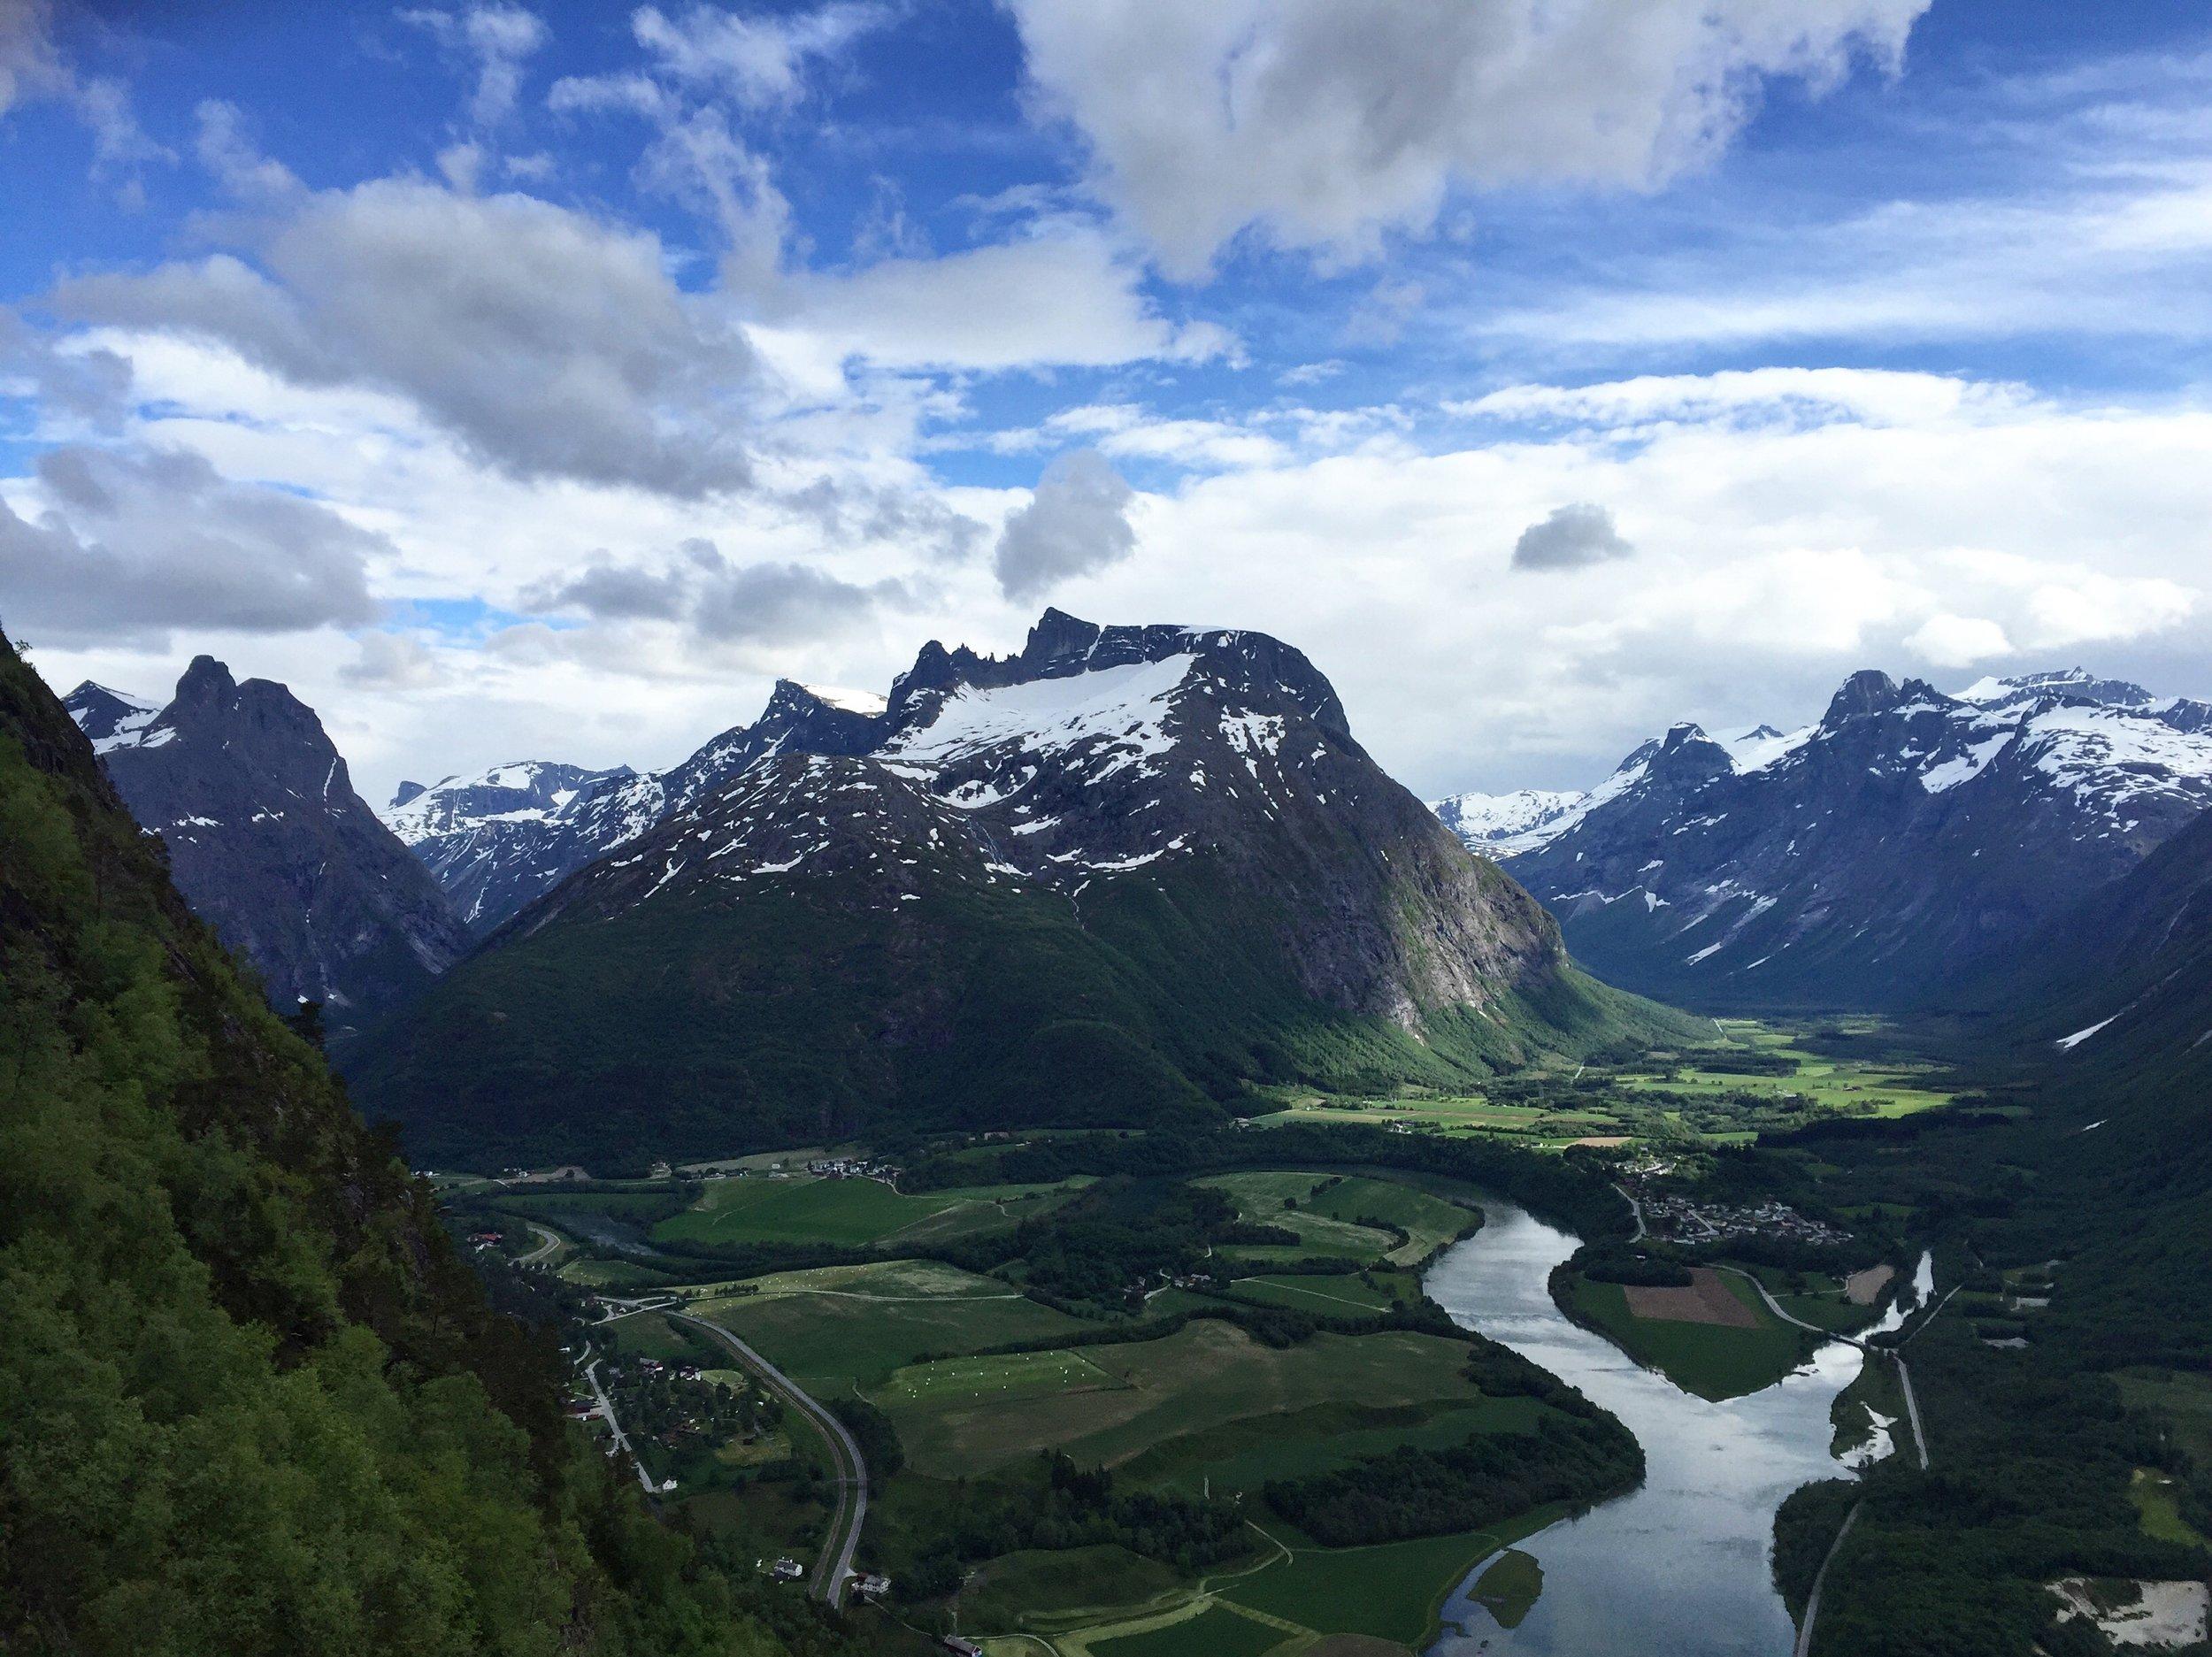 View from Rampestreken viewpoint.